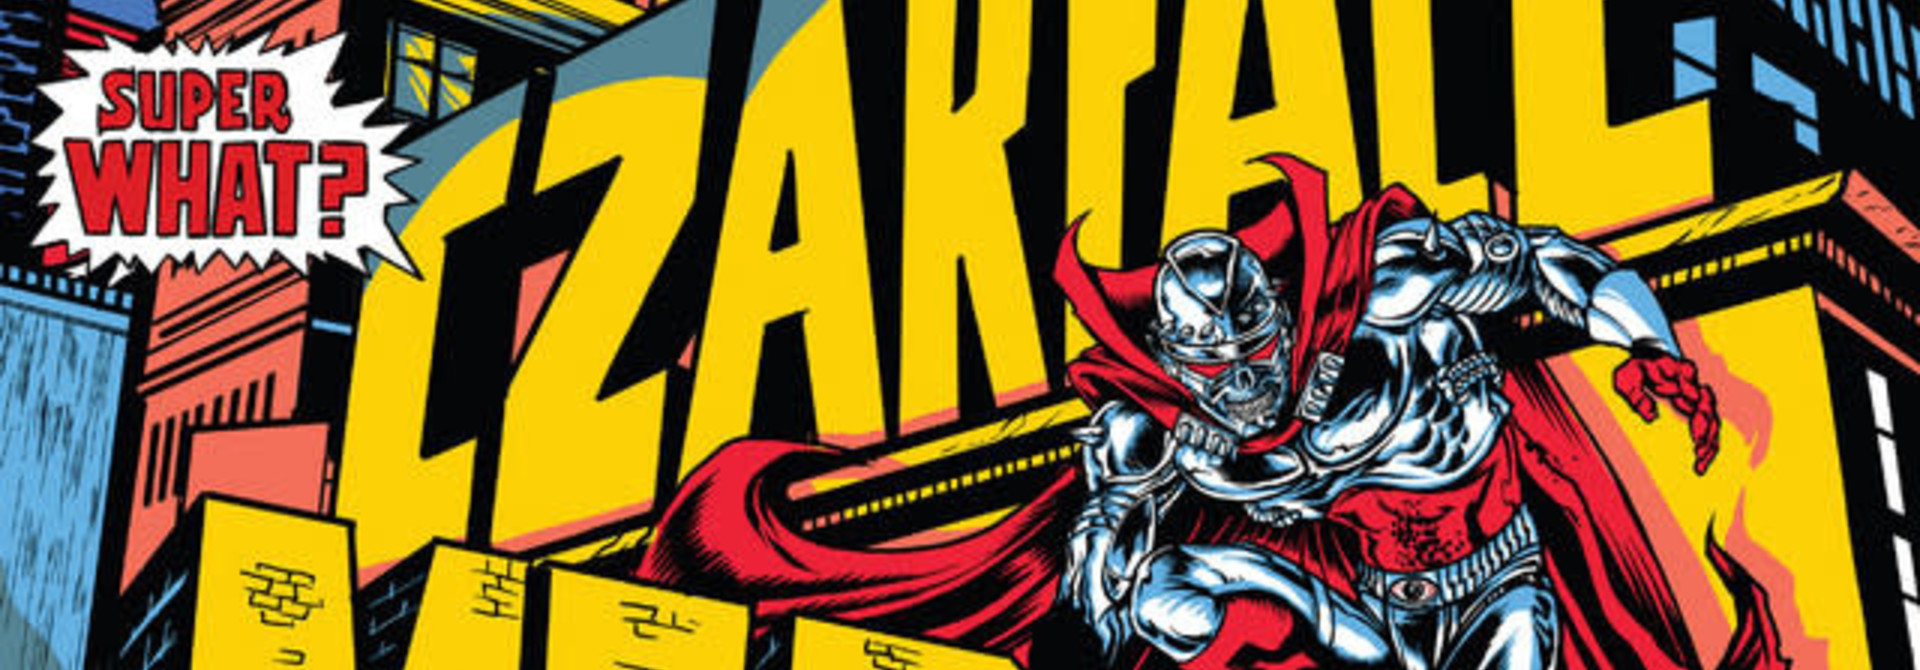 Czarface & MF DOOM • Super What?